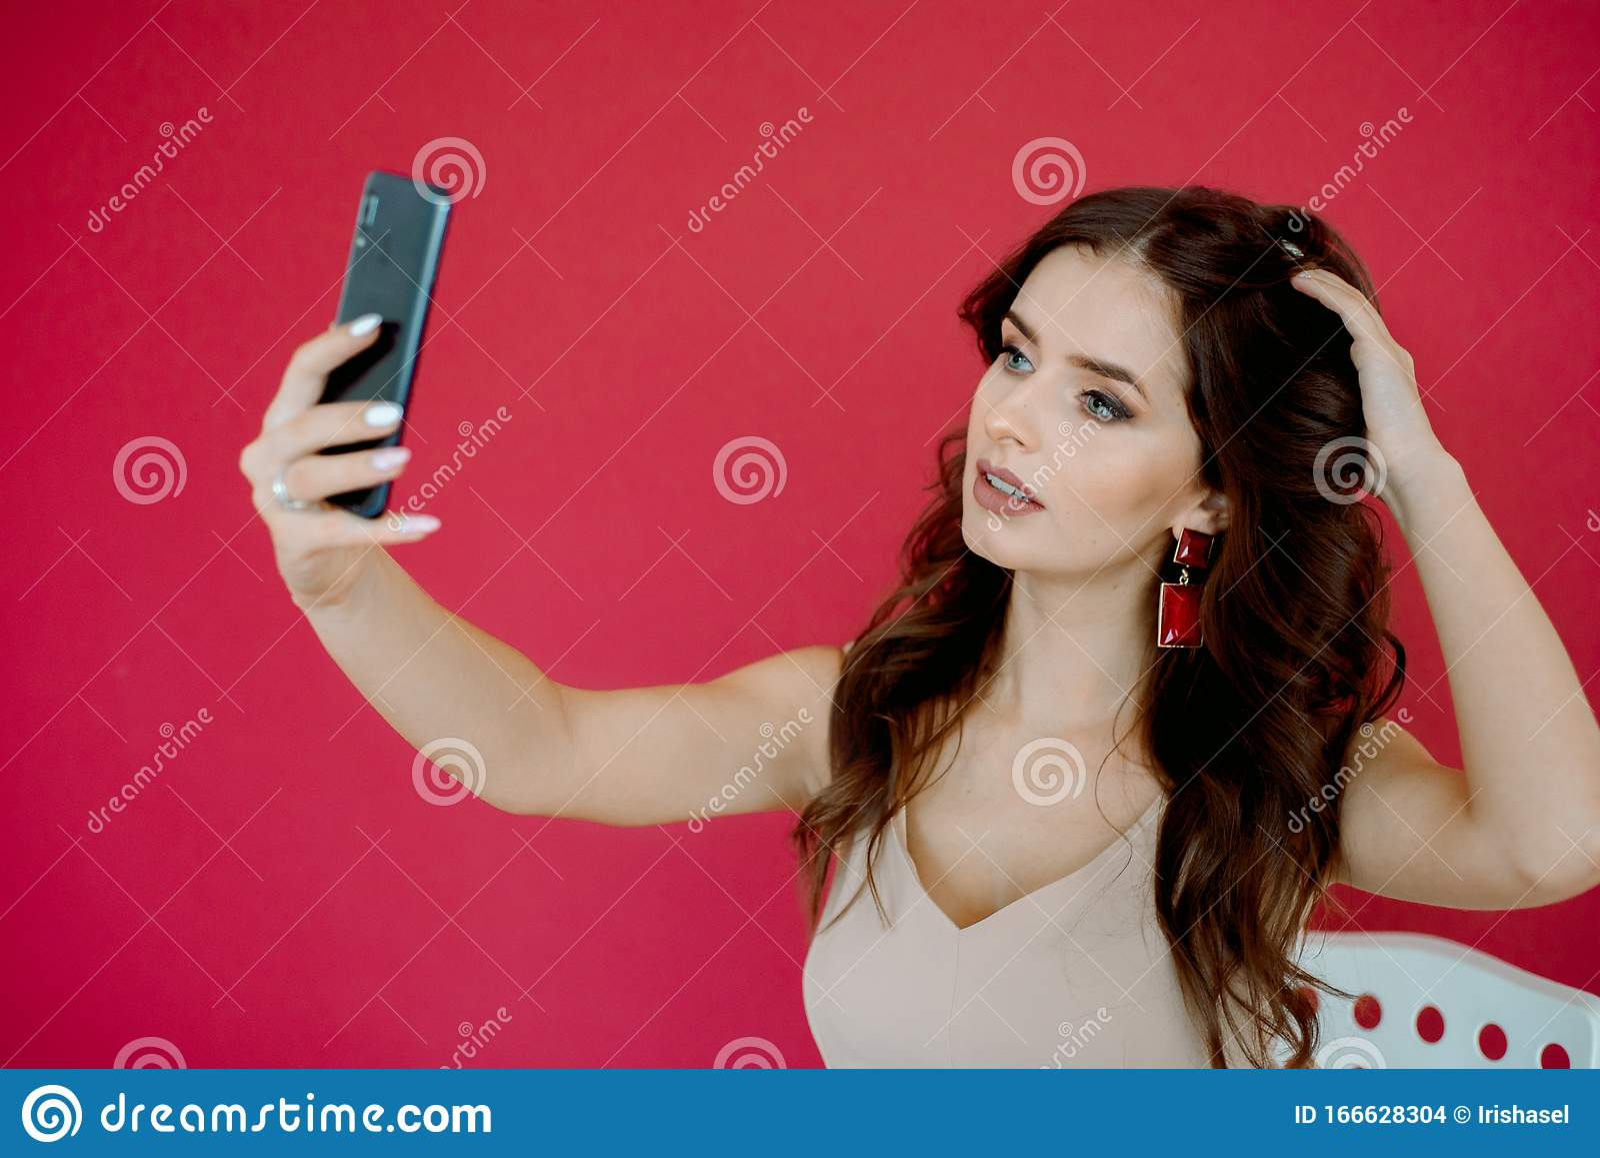 Free self shot pictures Free Shipping W 2622 1 12 High School Girl Self Shot Unpainted Resin Kit Ebay